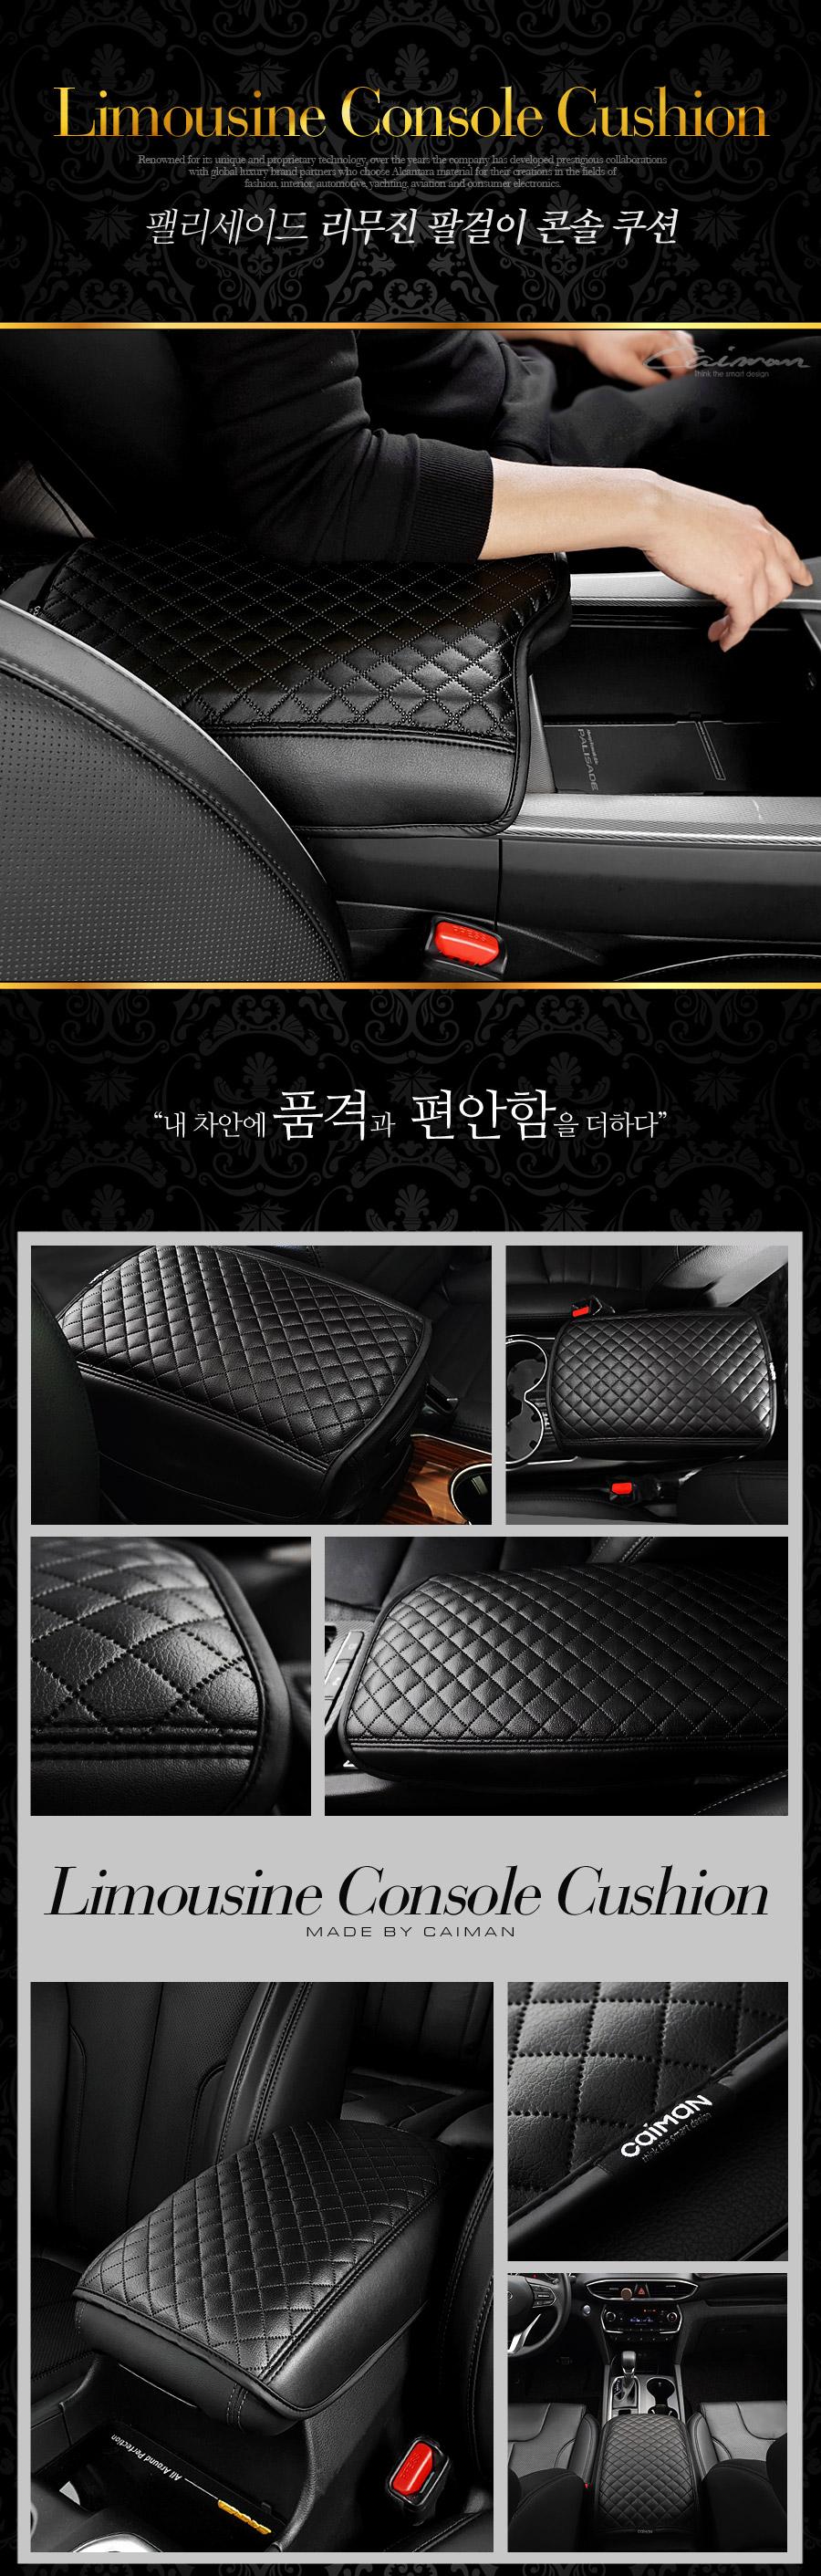 palisade-limousine-cushion_01.jpg